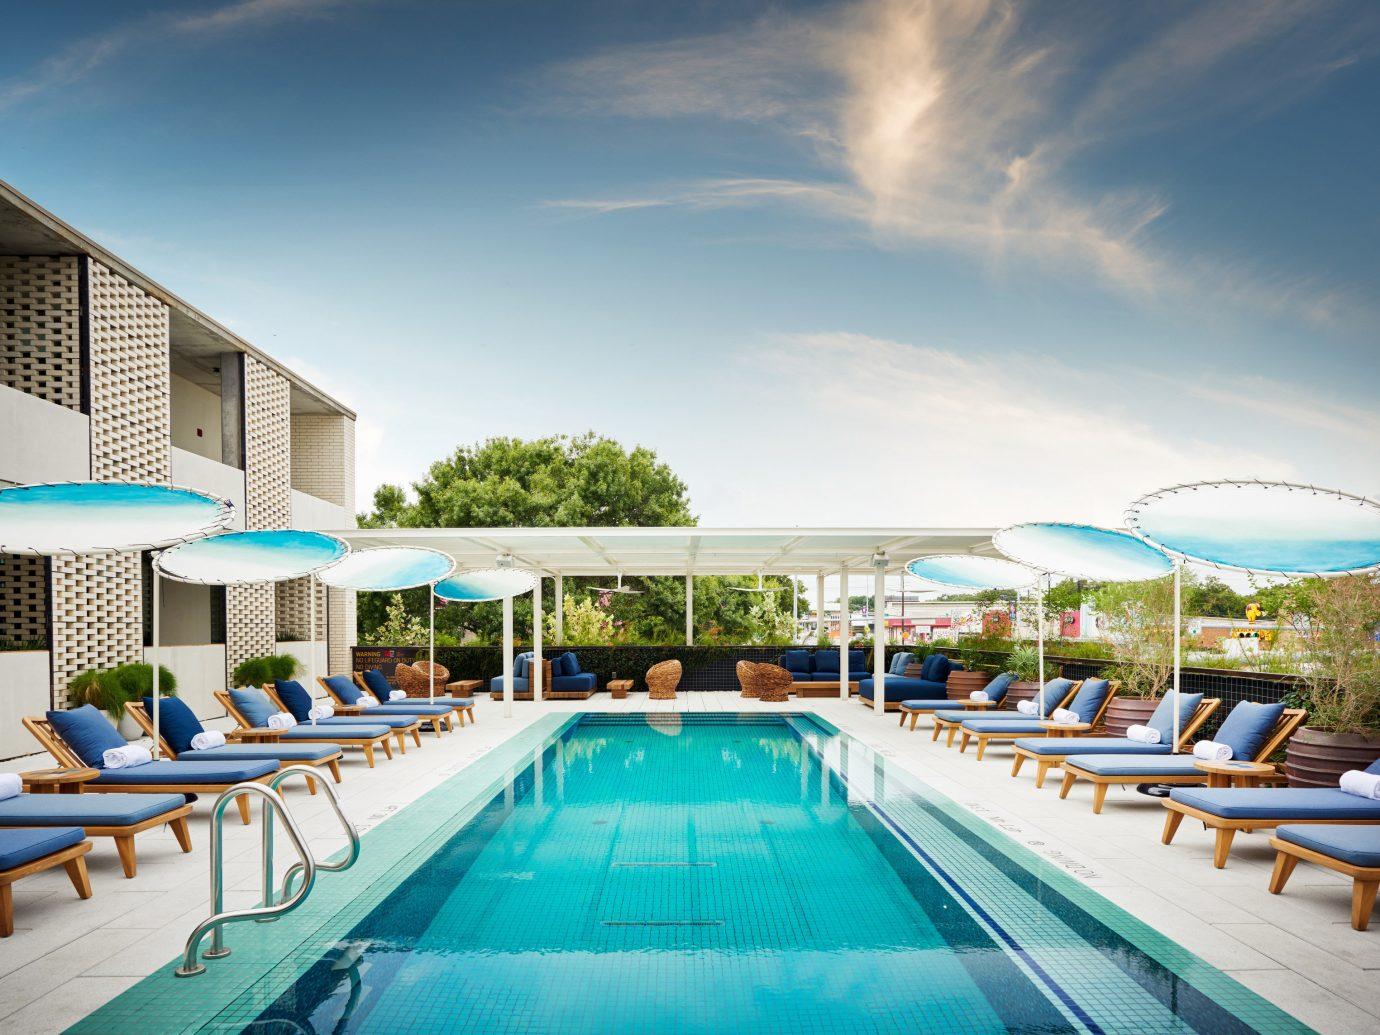 Pool at South Congress Hotel